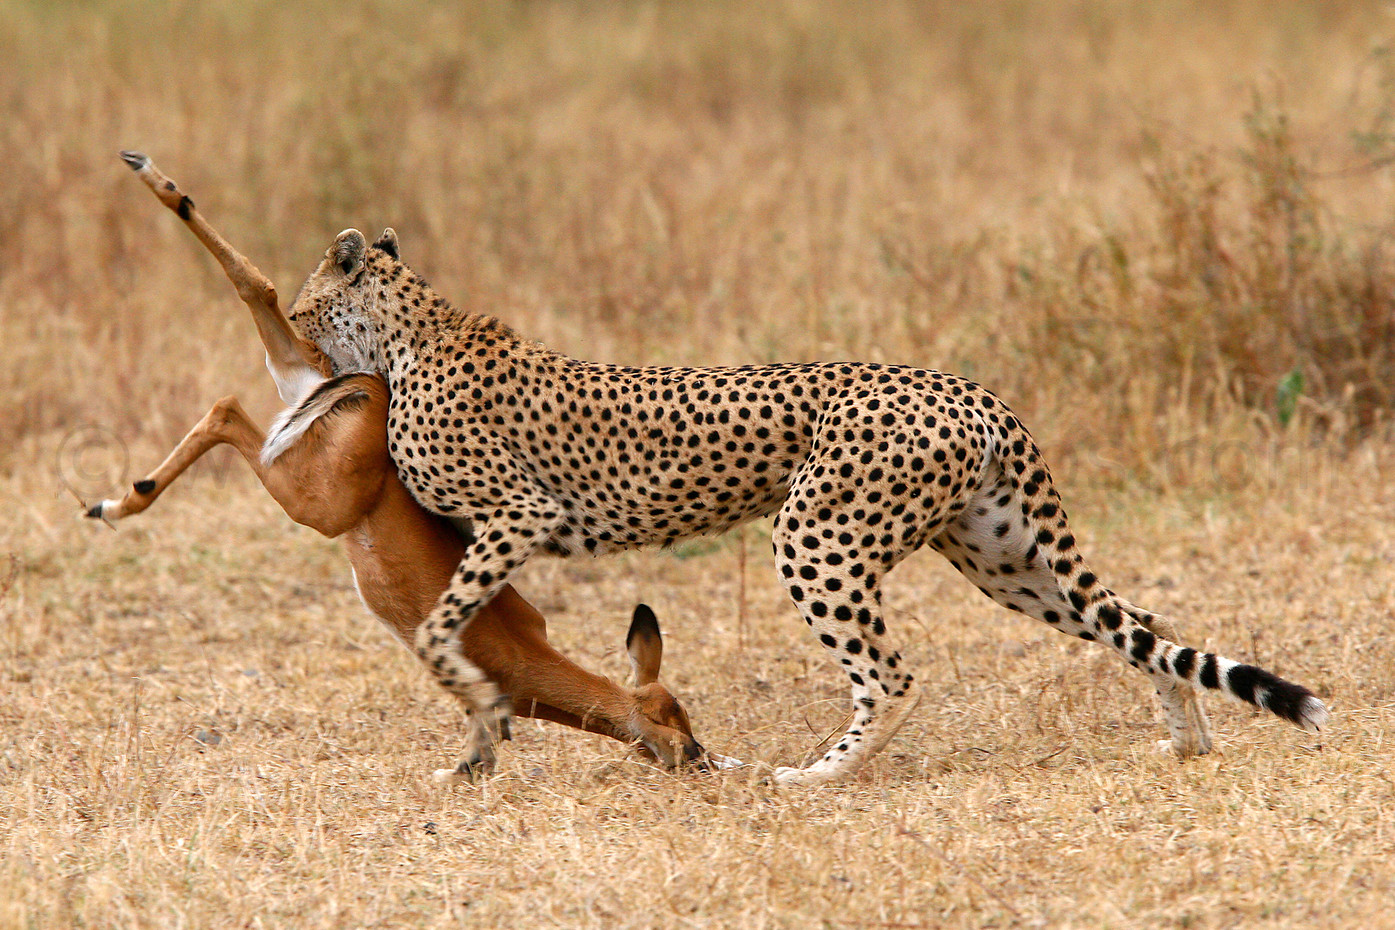 Cheetah & Impala kill in the Serengeti NP, Tanzania